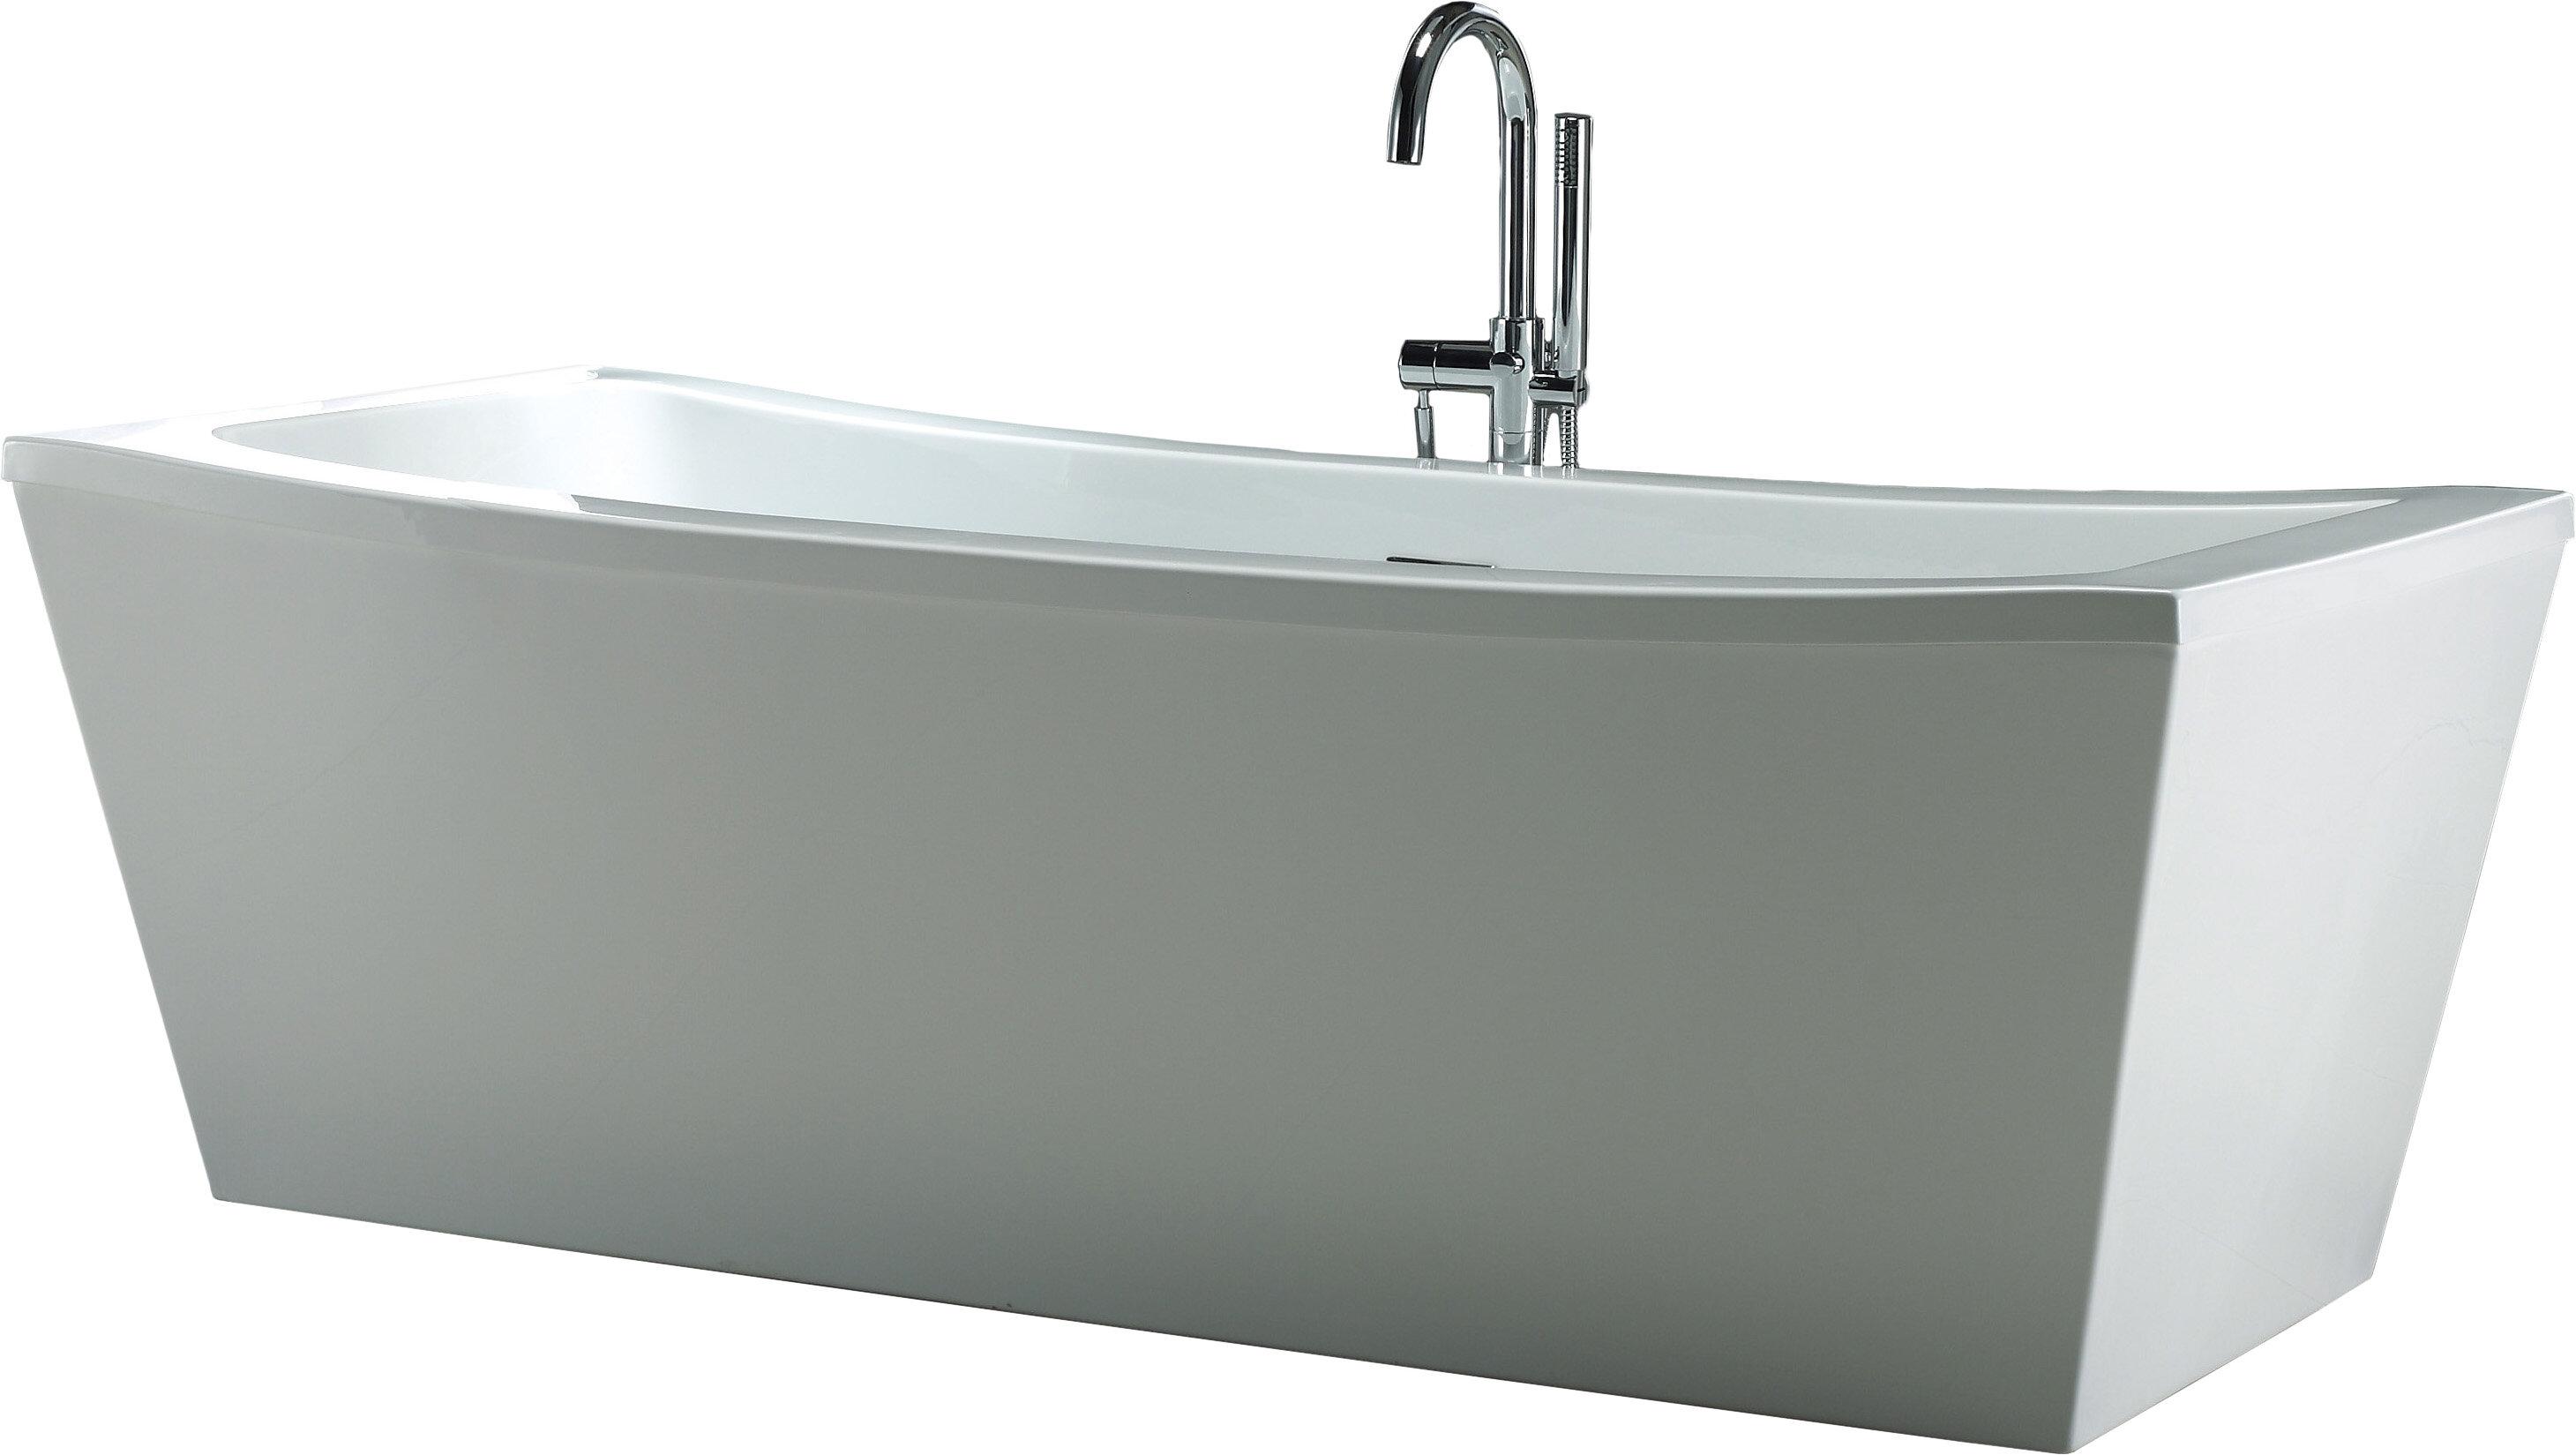 bathtubs free wyndham today bathtub oval aarhus garden overstock shipping product home freestanding